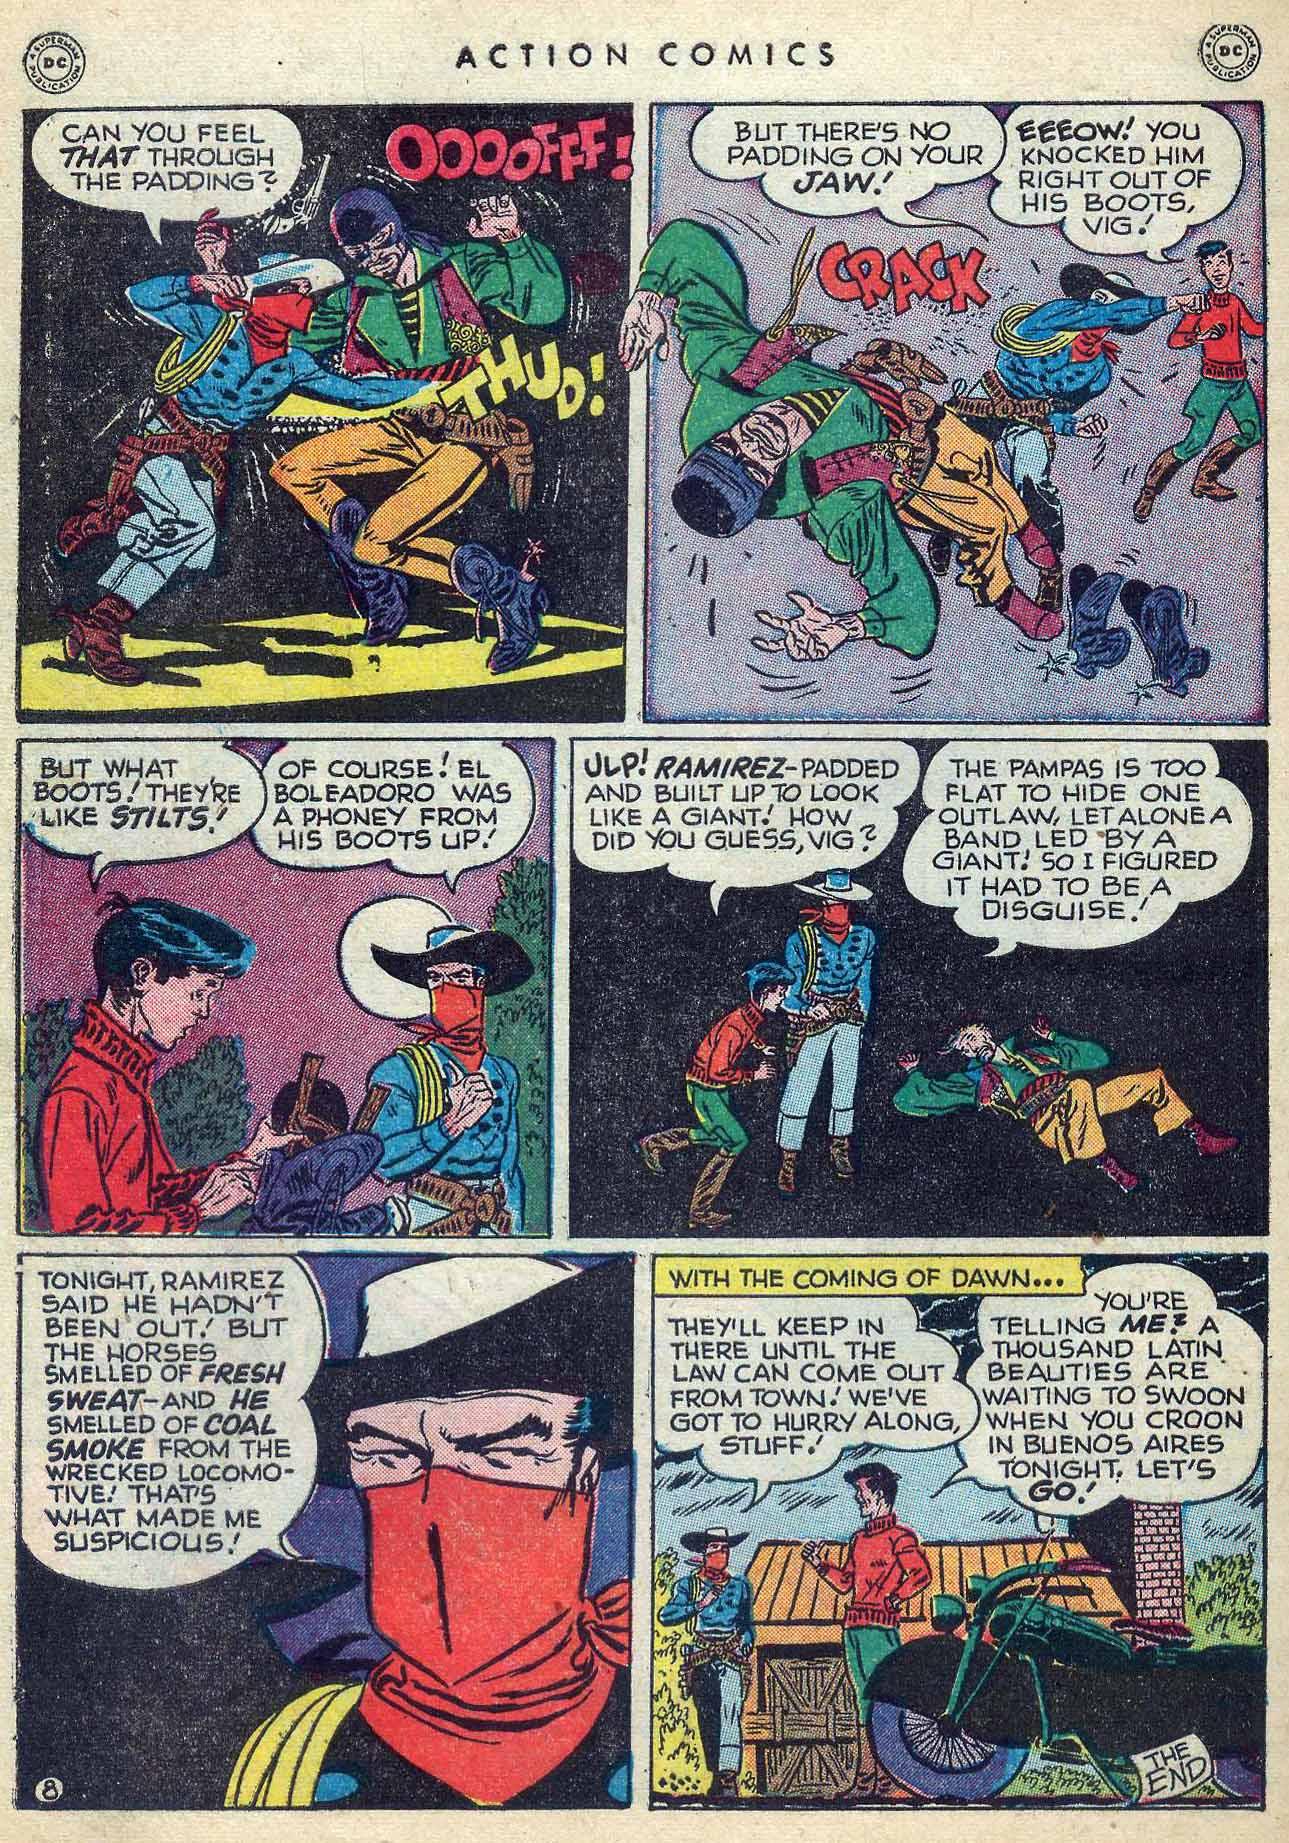 Action Comics (1938) 127 Page 49